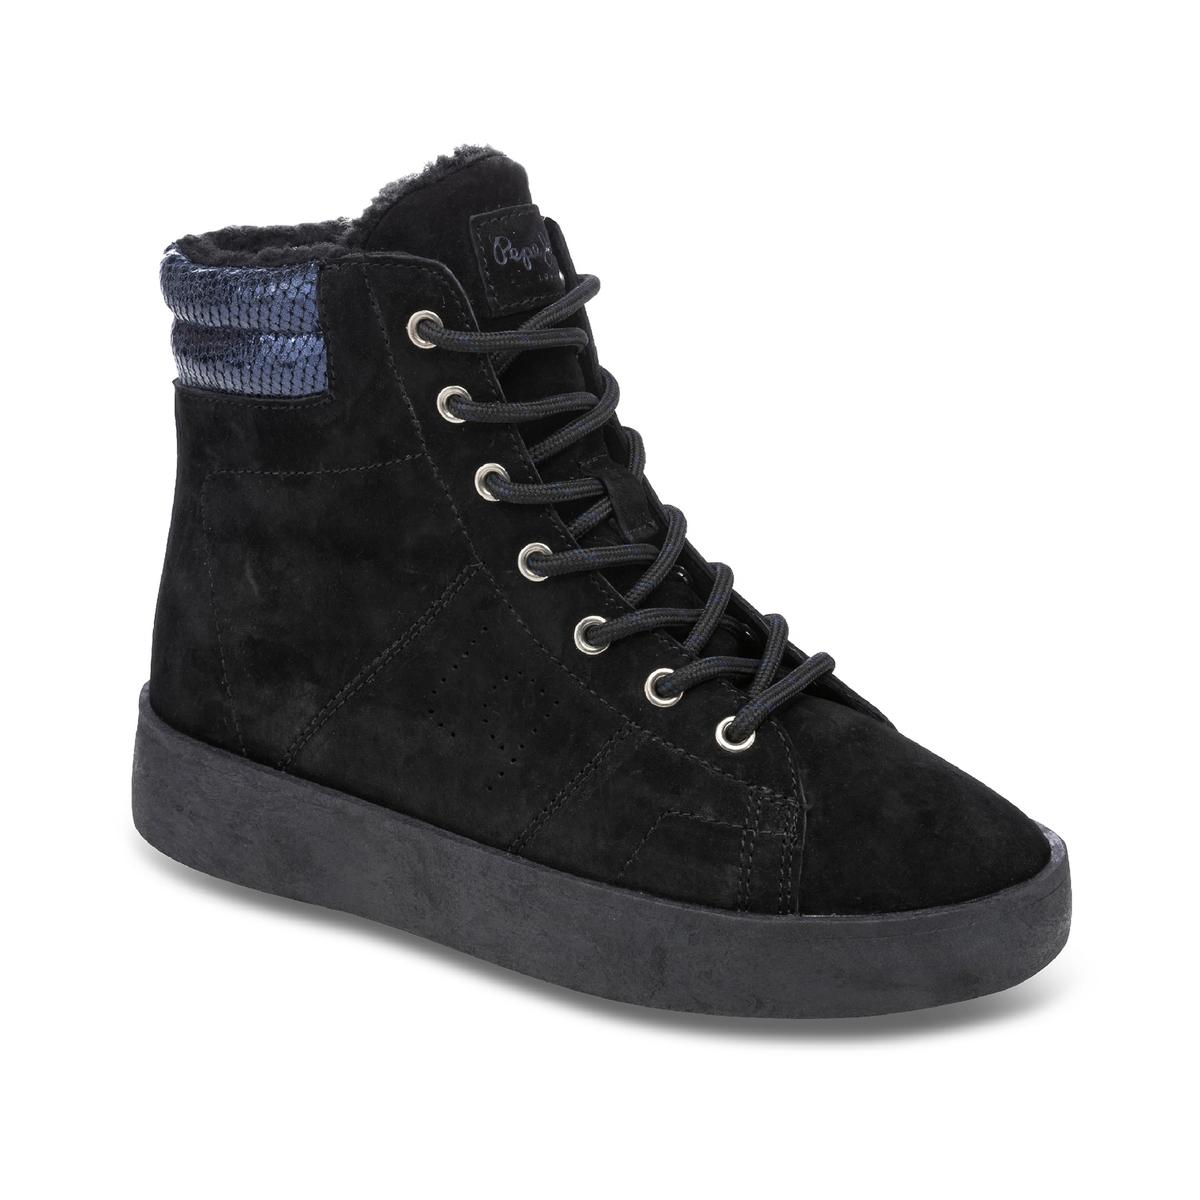 Imagen secundaria de producto de Zapatillas de caña alta Brixton - Pepe Jeans